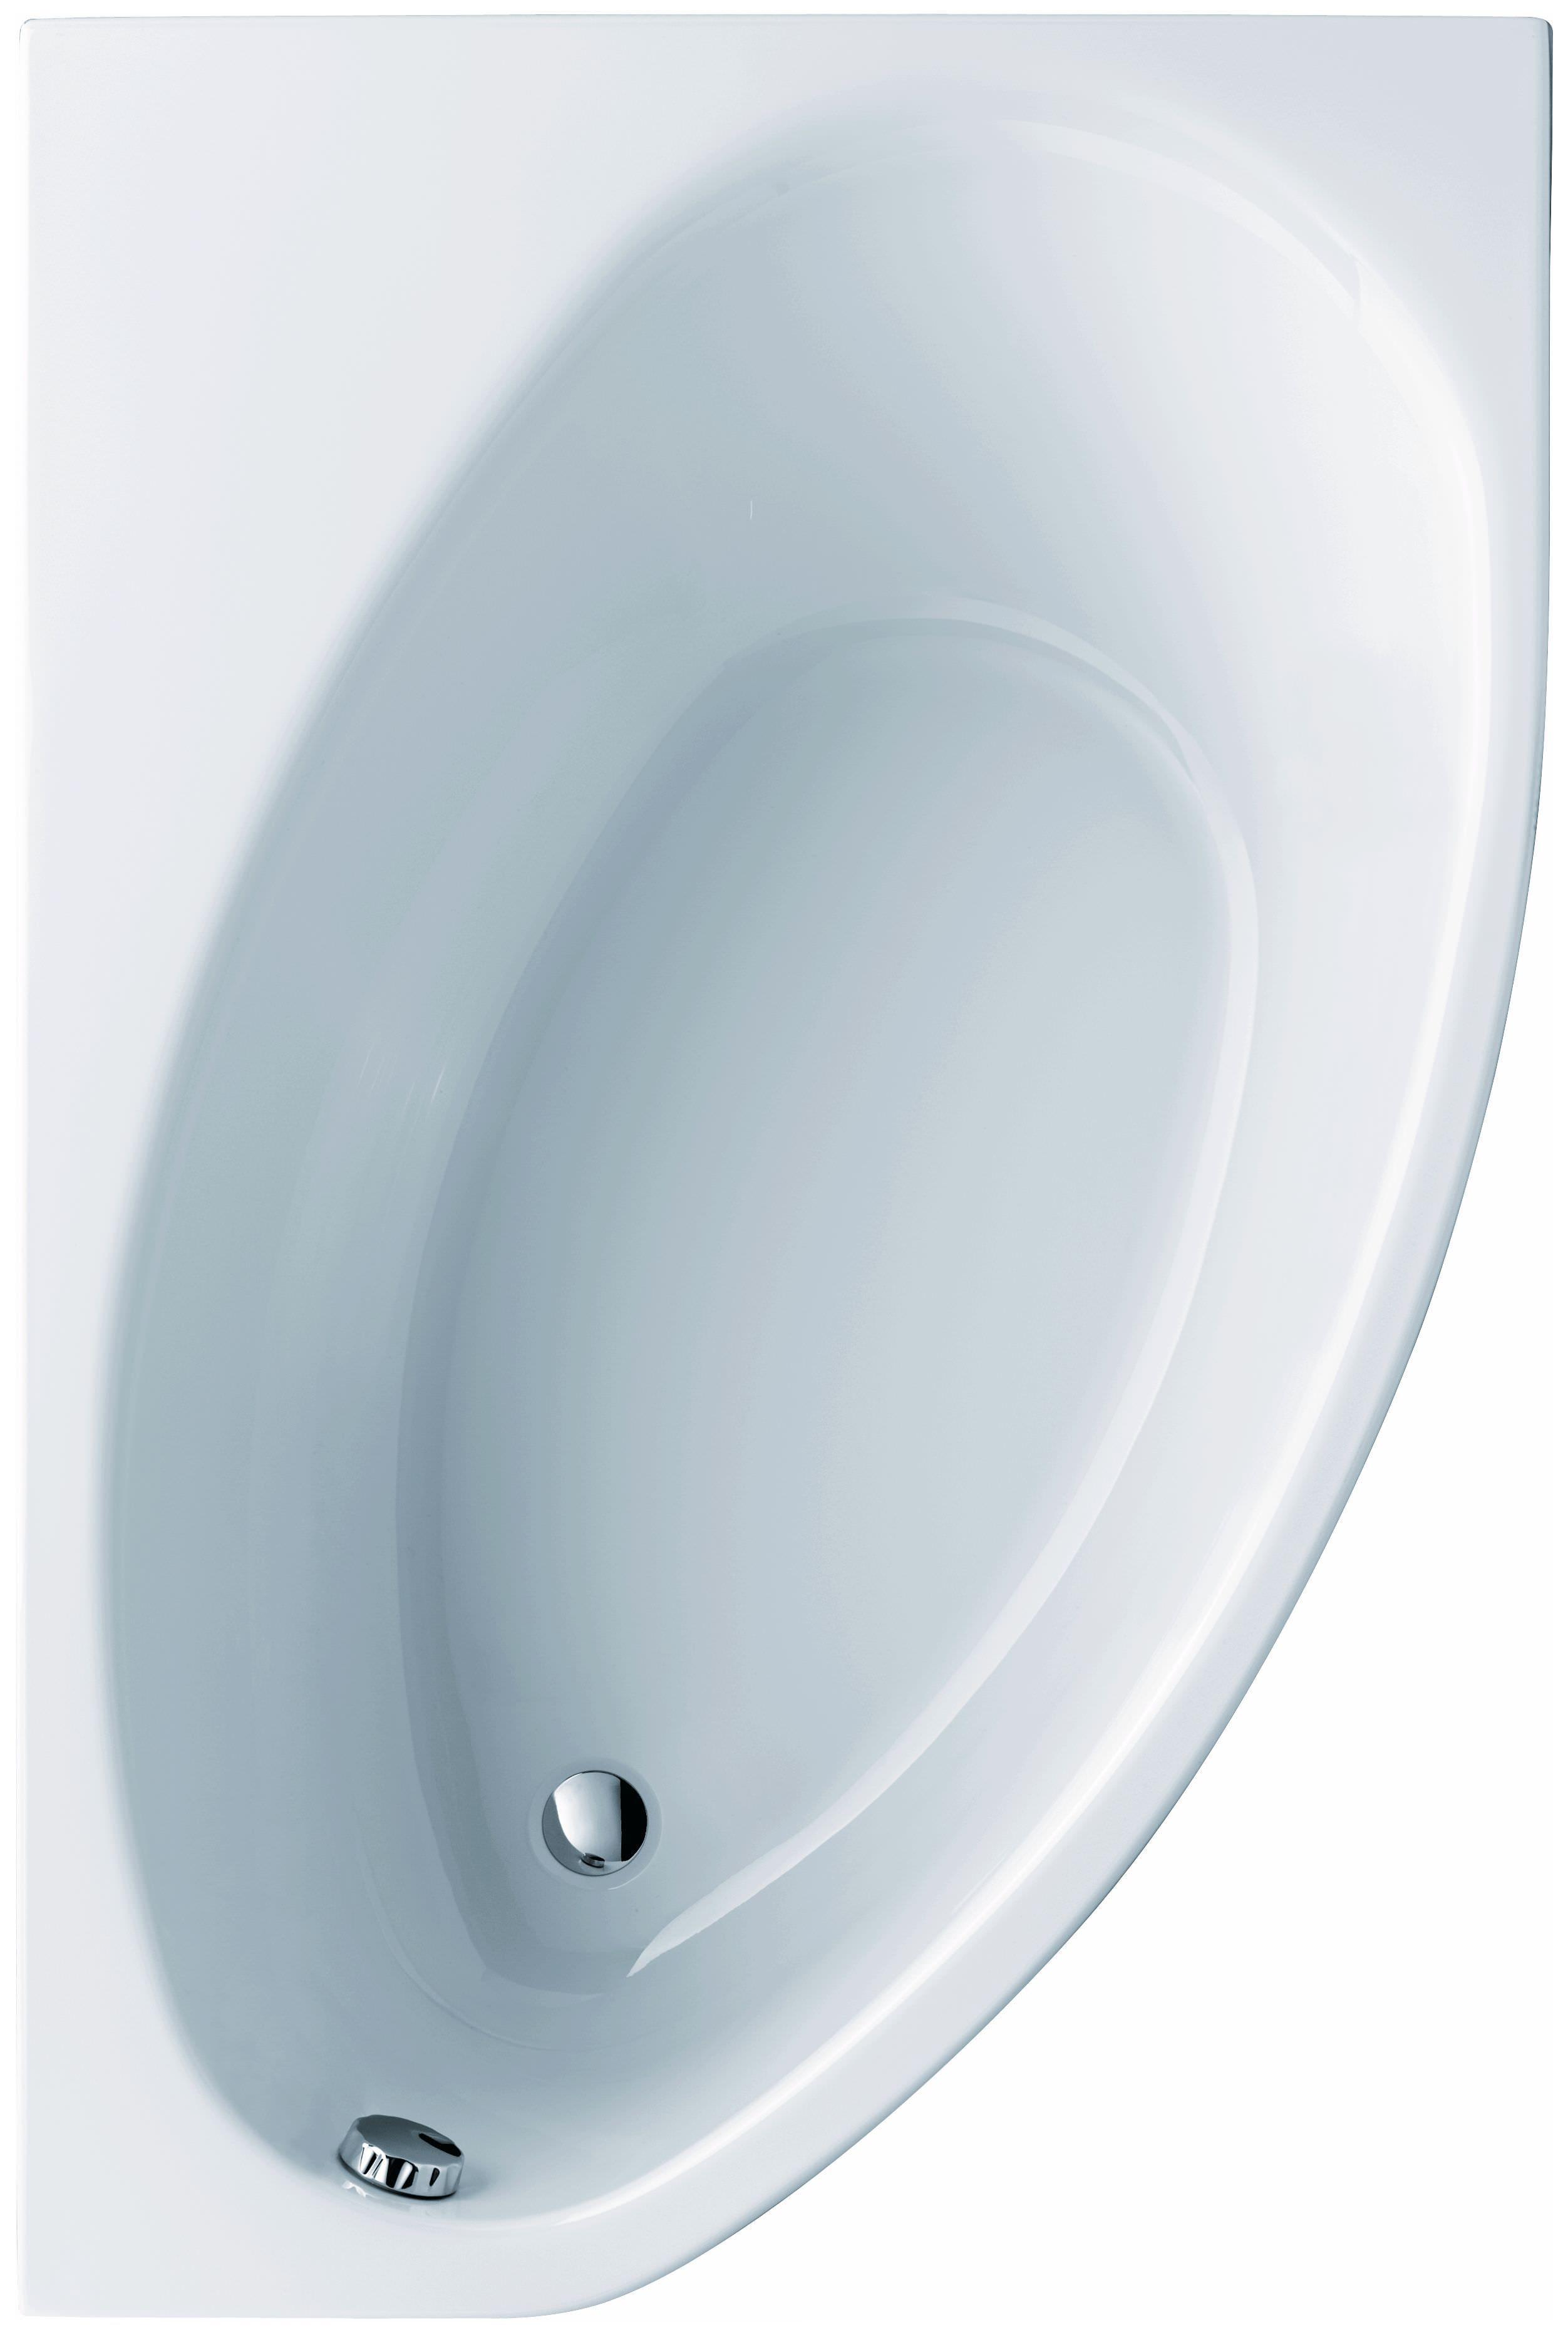 Keramag Geberit Renova Nr 1 Asymmetrische Eckbadewanne 657340 1500mm X 1000mm Weiss Alpin Keramag Eckbadewanne Wanne